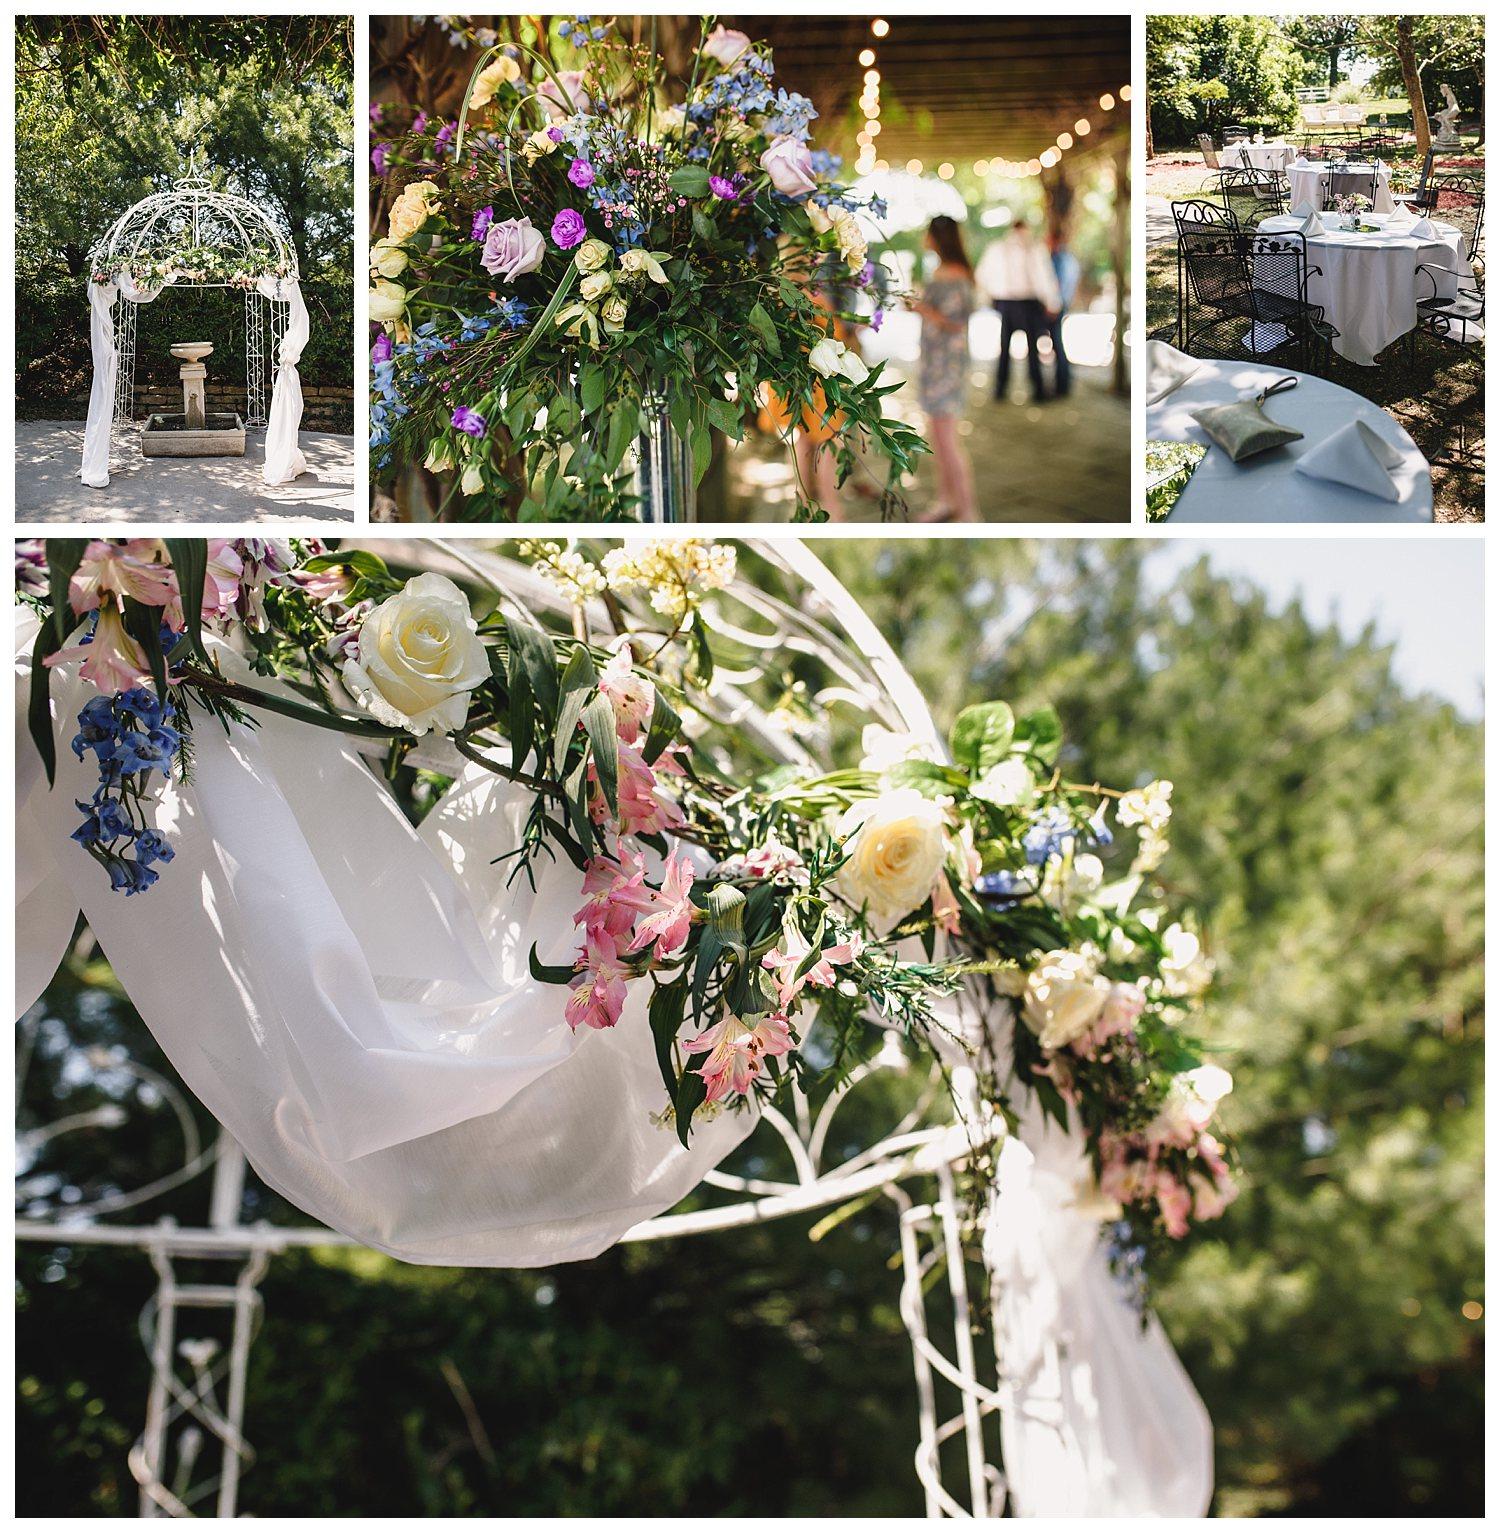 Kelsey_Diane_Photography_Kansas_City_Engagement_Wedding_Photographer_Midwest_Traveling_Missouri_Lee_Andrew_Hall_And_Garden_Blue_Springs_Wedding_Clayton_Kimberly_Summer_Wedding_0832.jpg